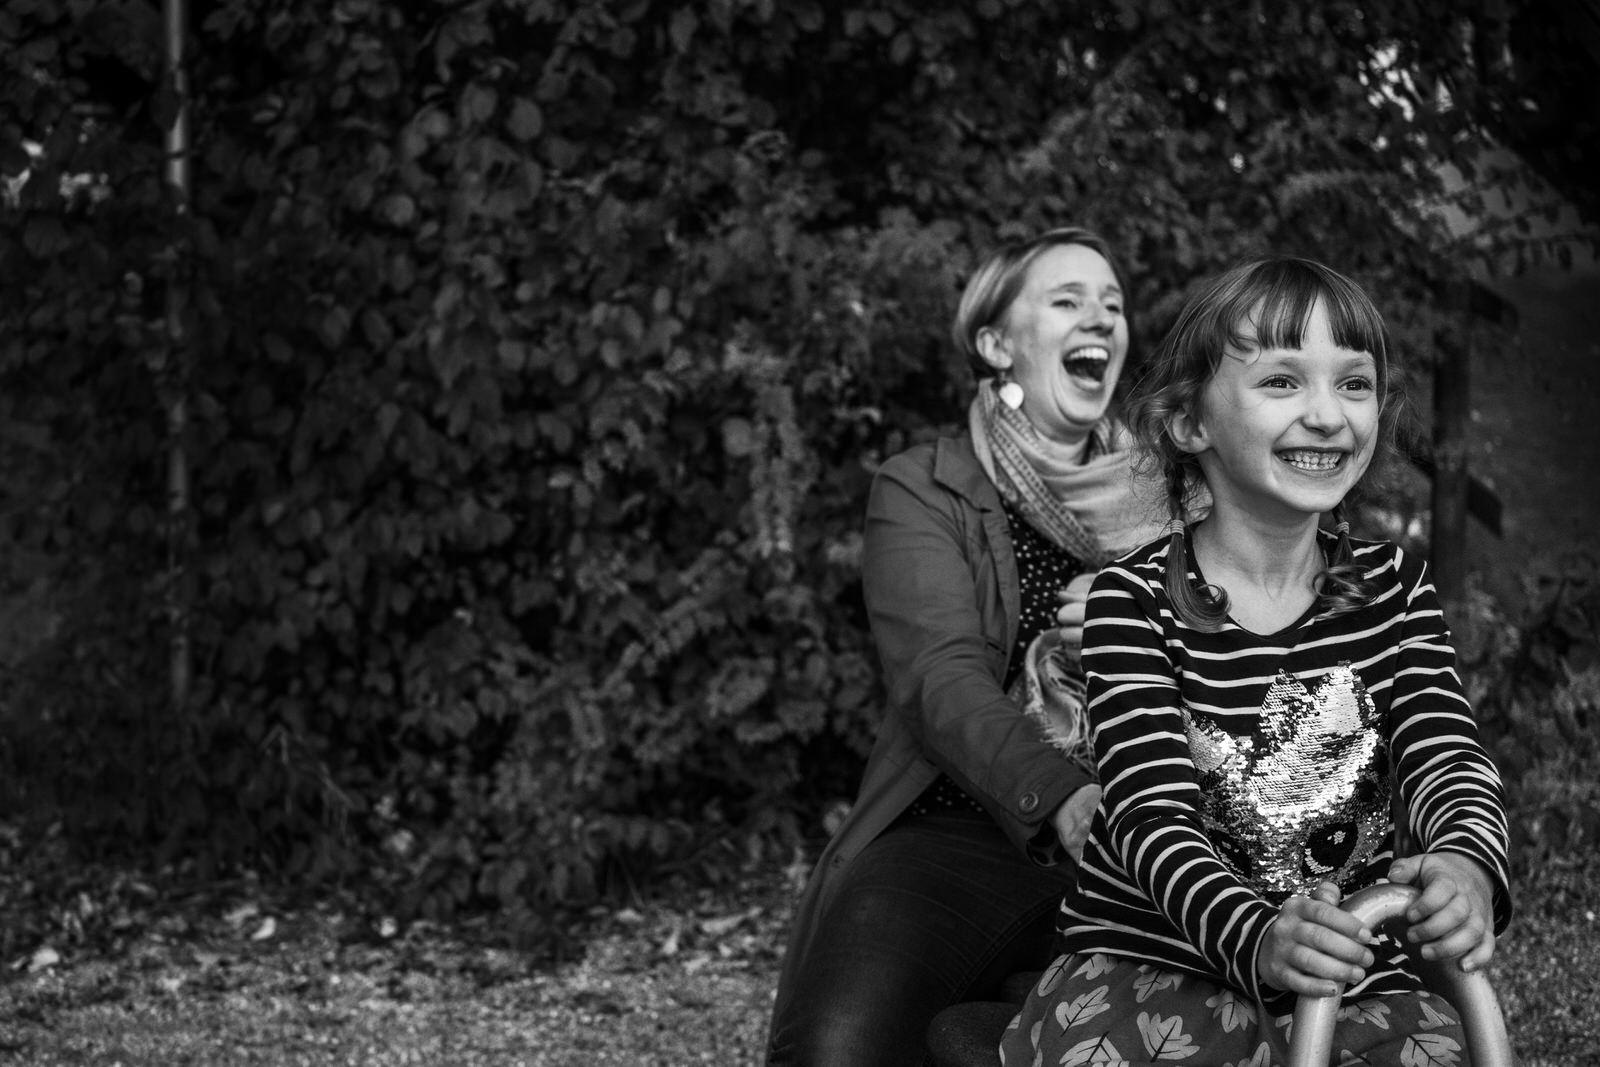 Familienreportage Lörrach | Familienfotografin Julia Erz